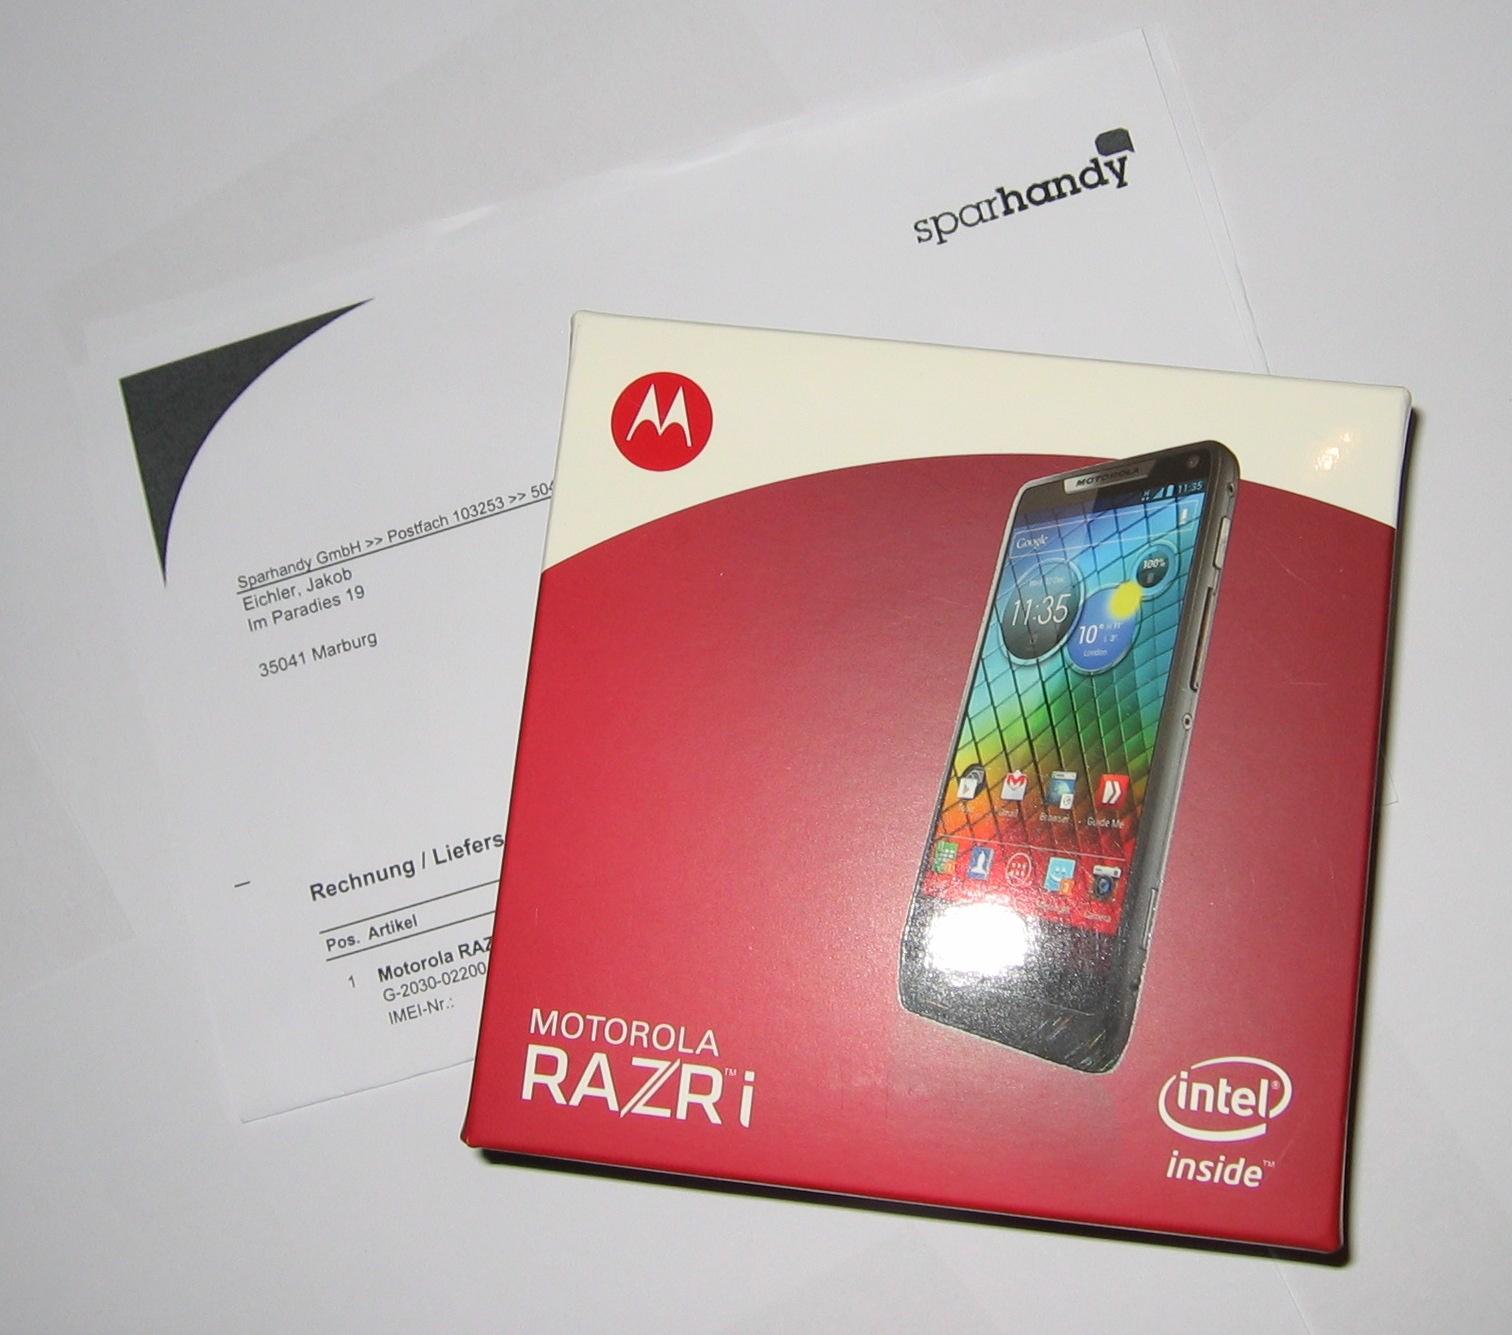 Motorola-RAZR I-Verpackung